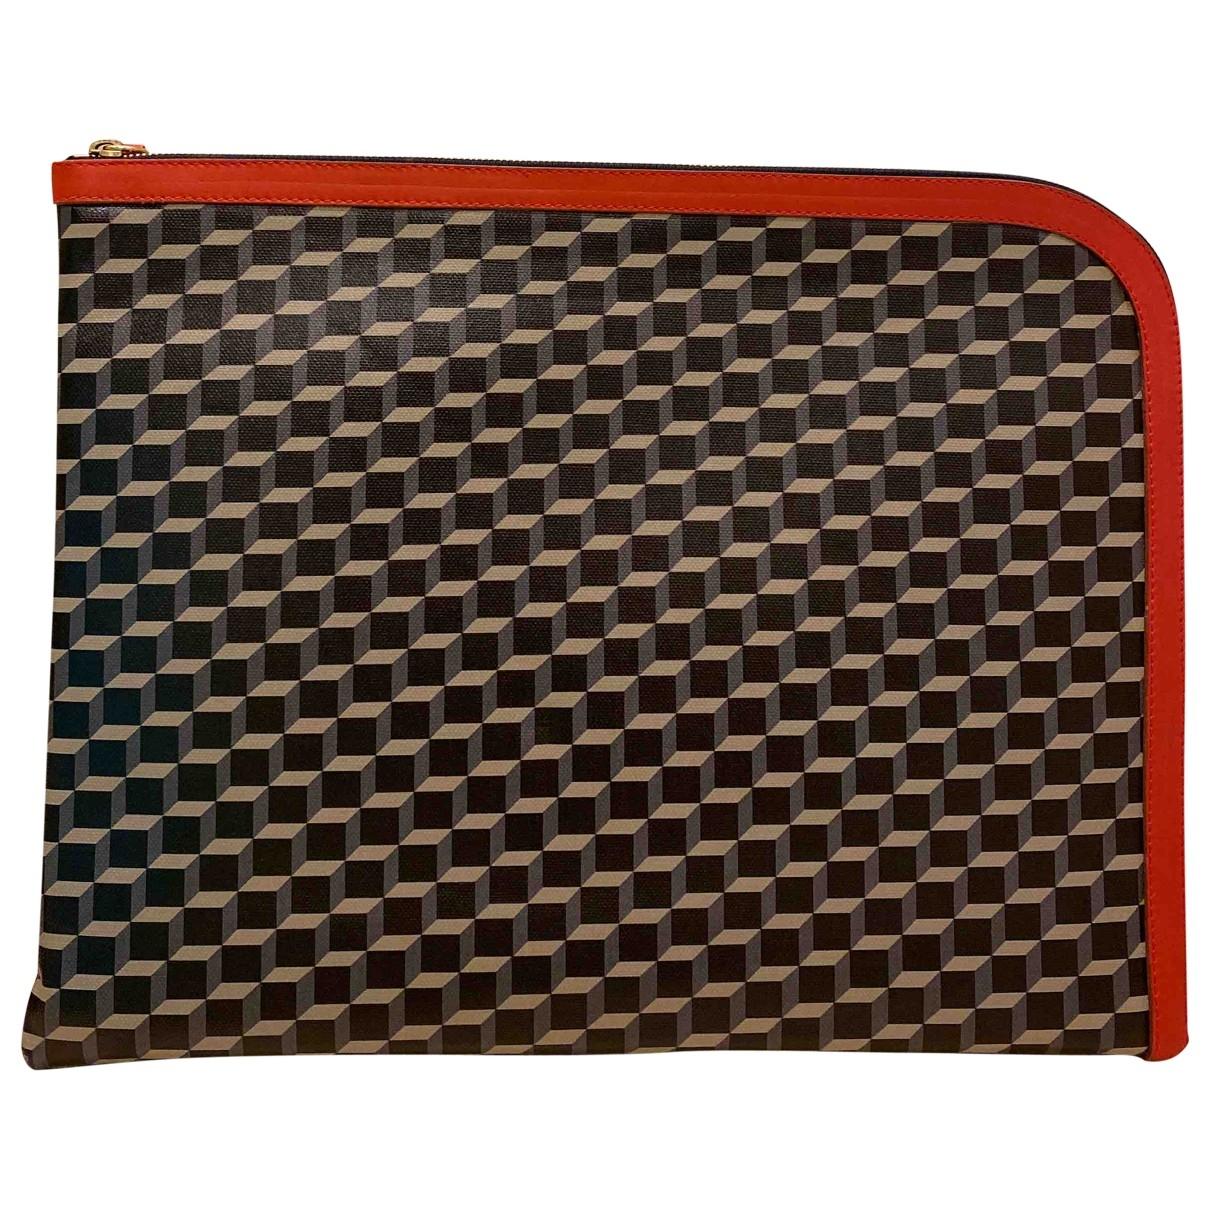 Pierre Hardy \N Multicolour Leather Clutch bag for Women \N